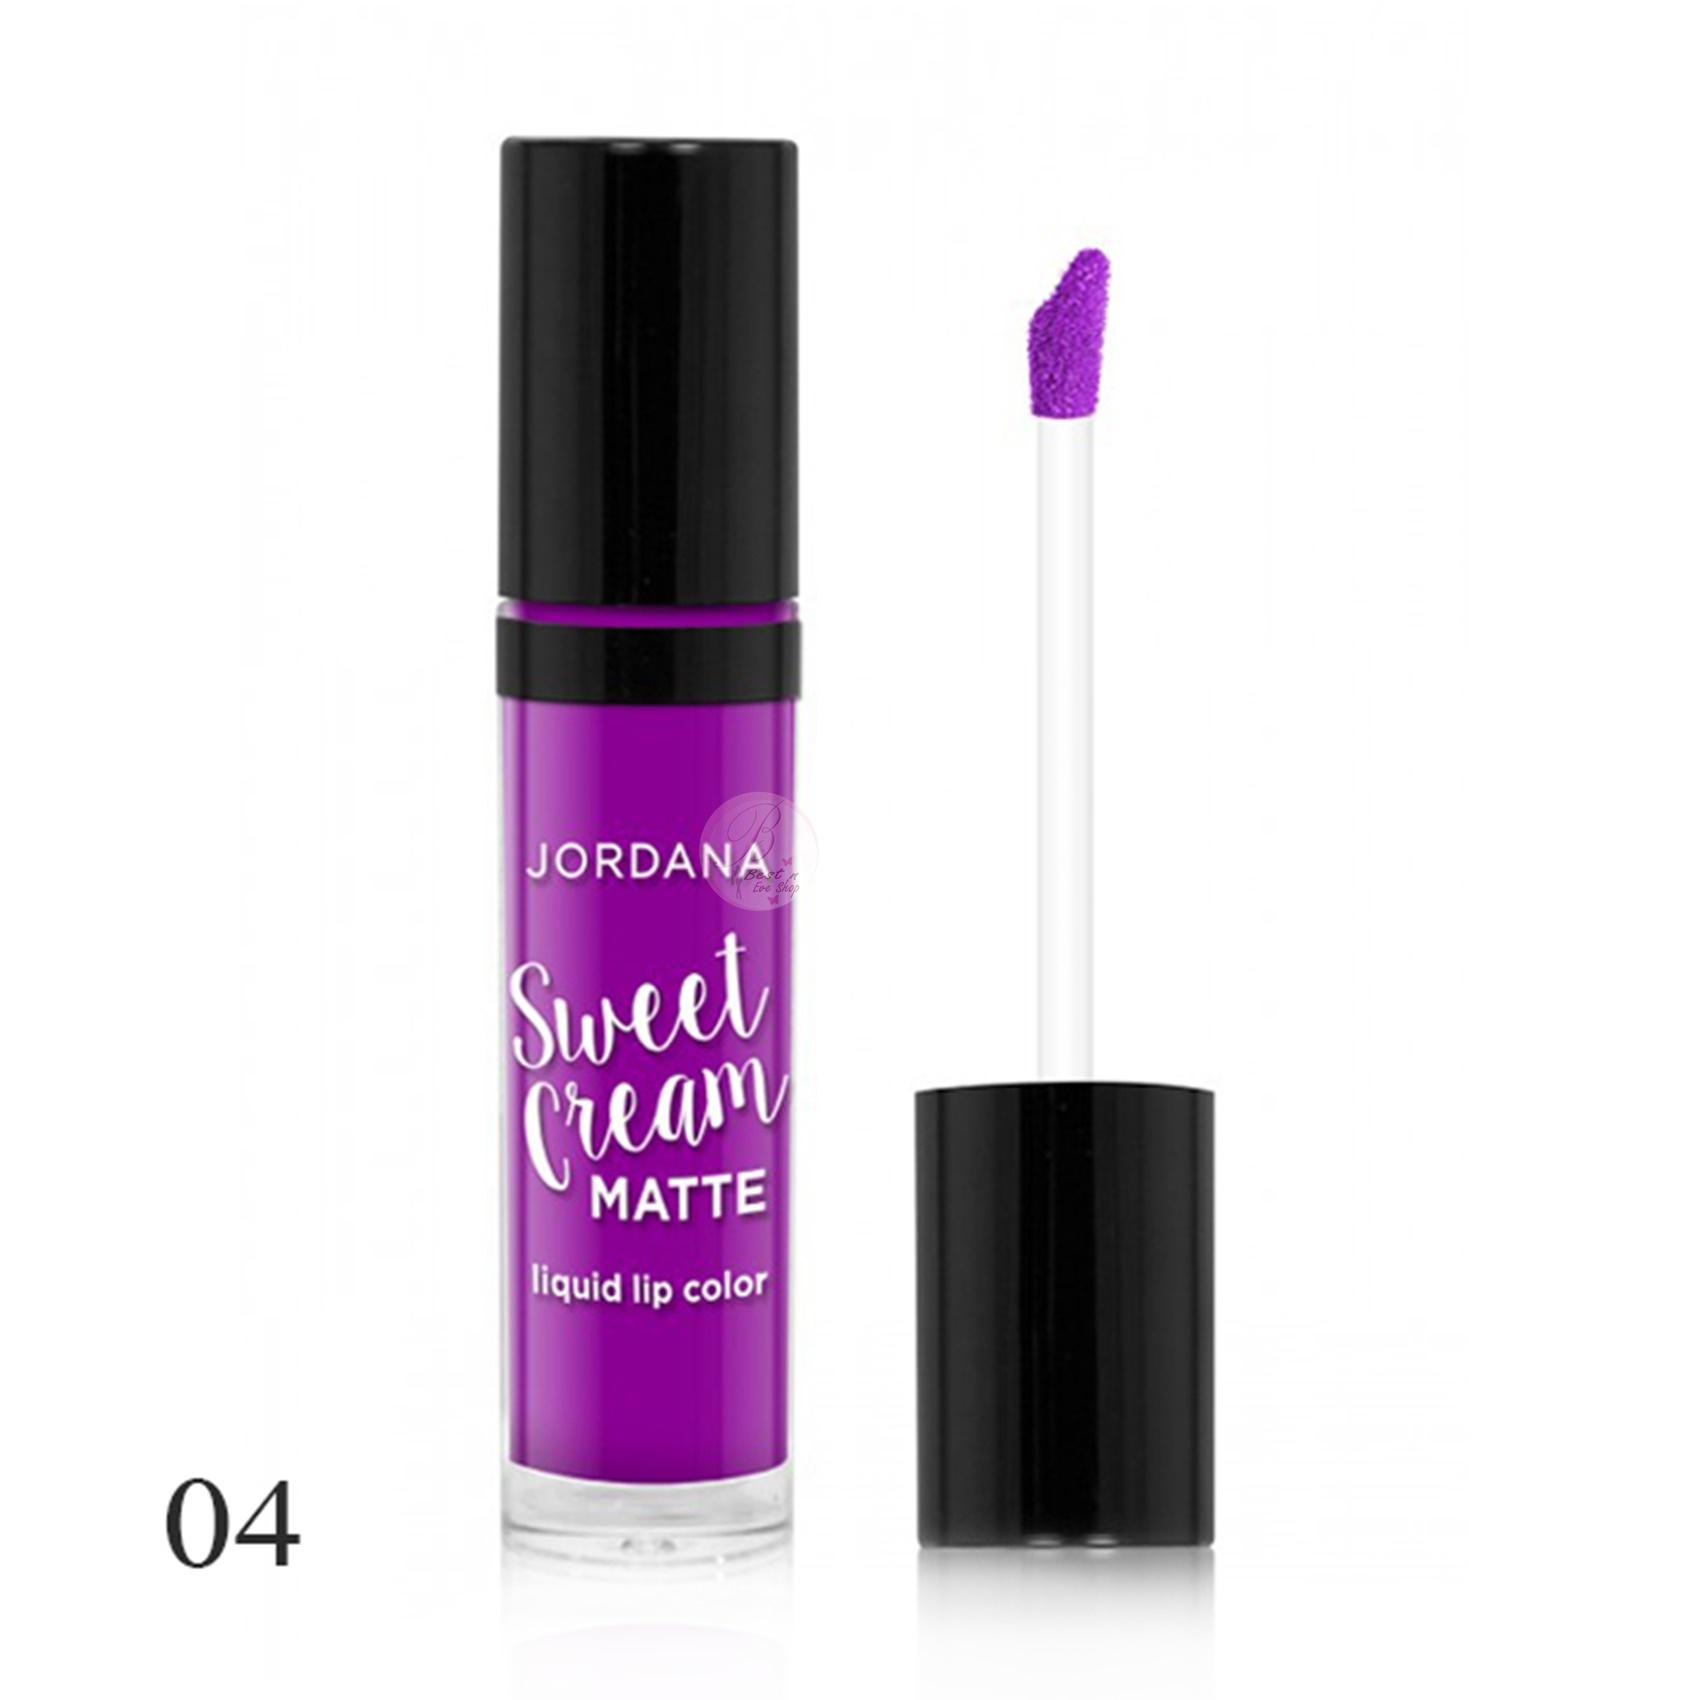 Jordana Sweet Cream Matte Liquid Lip Color # 04 Mixed Berry Souffle 3g